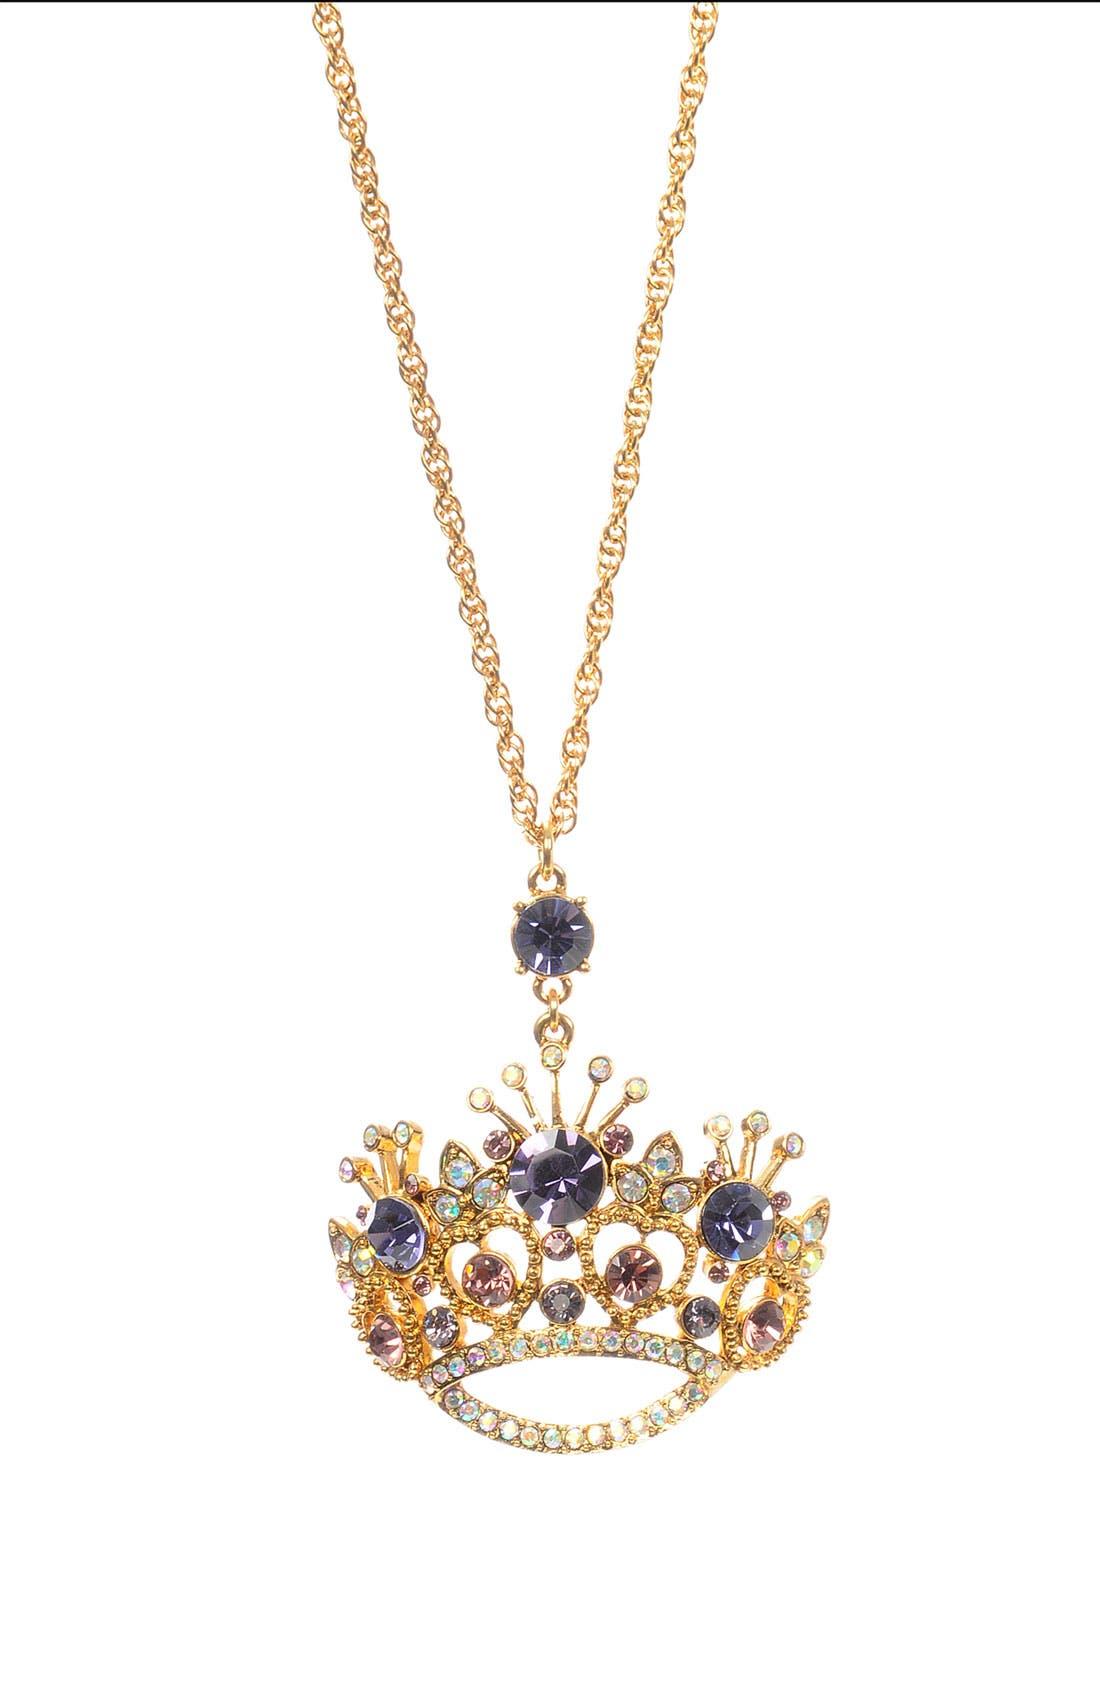 Alternate Image 1 Selected - Betsey Johnson 'Tzar' Crown Statement Pendant Long Necklace